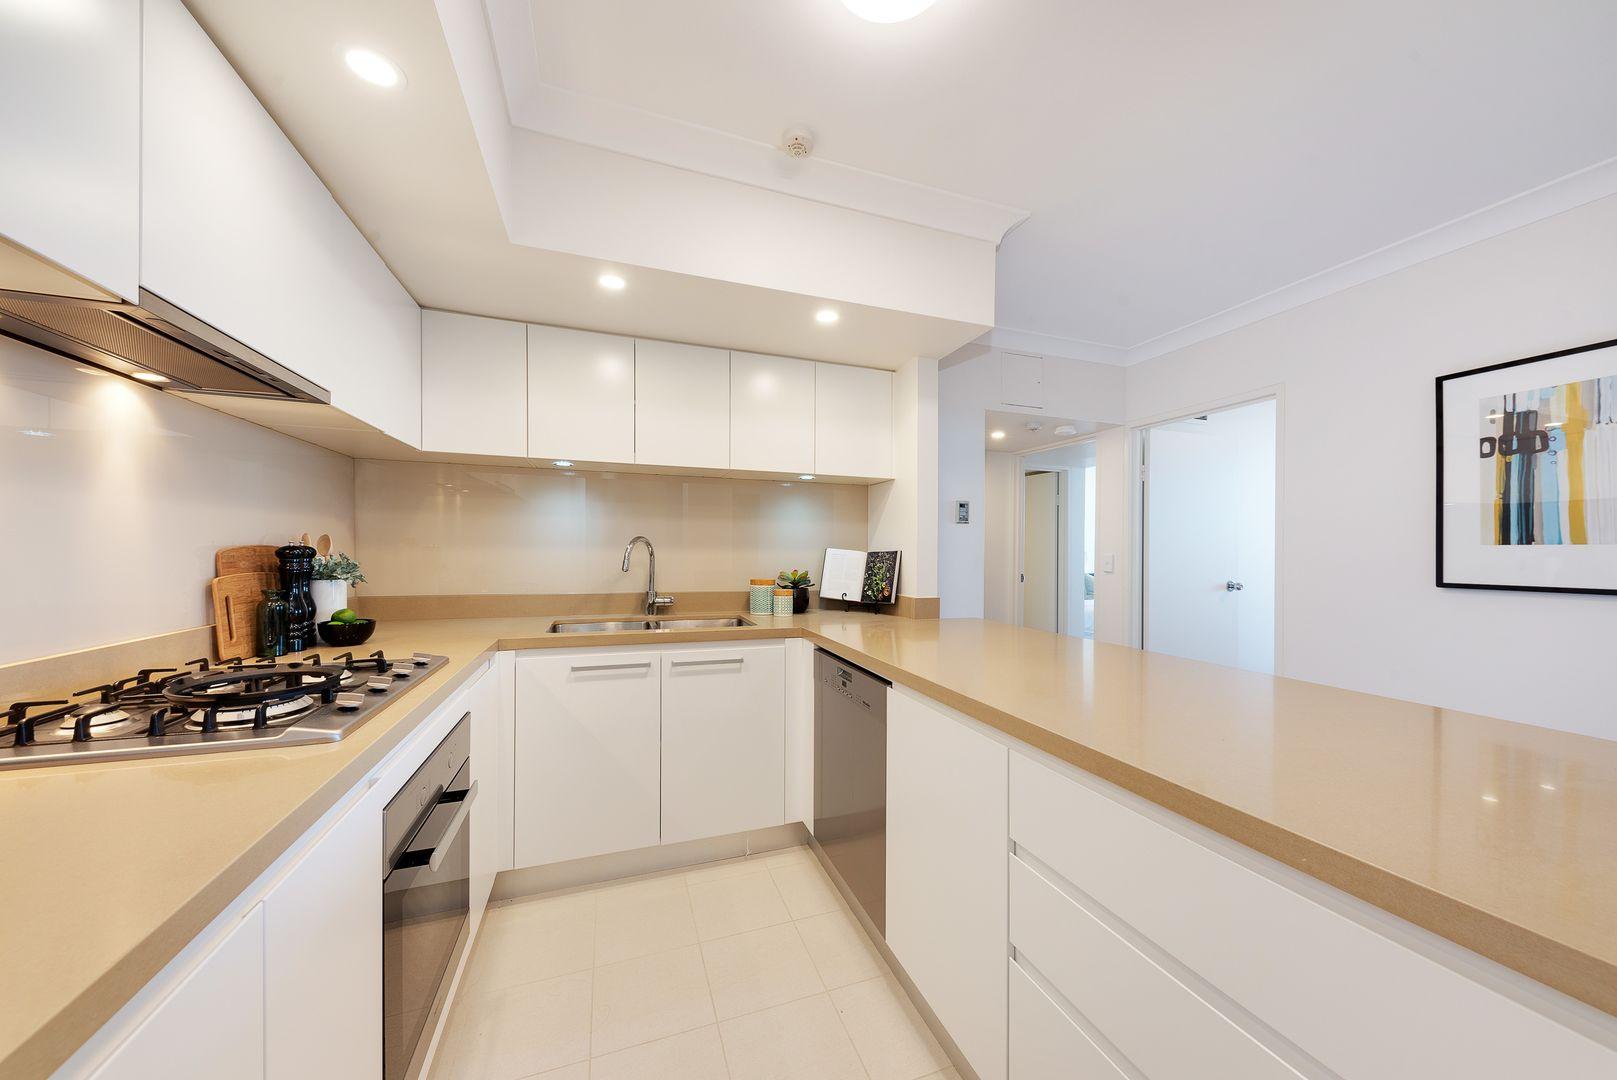 Unit 903/39 Mclaren St, North Sydney NSW 2060, Image 1